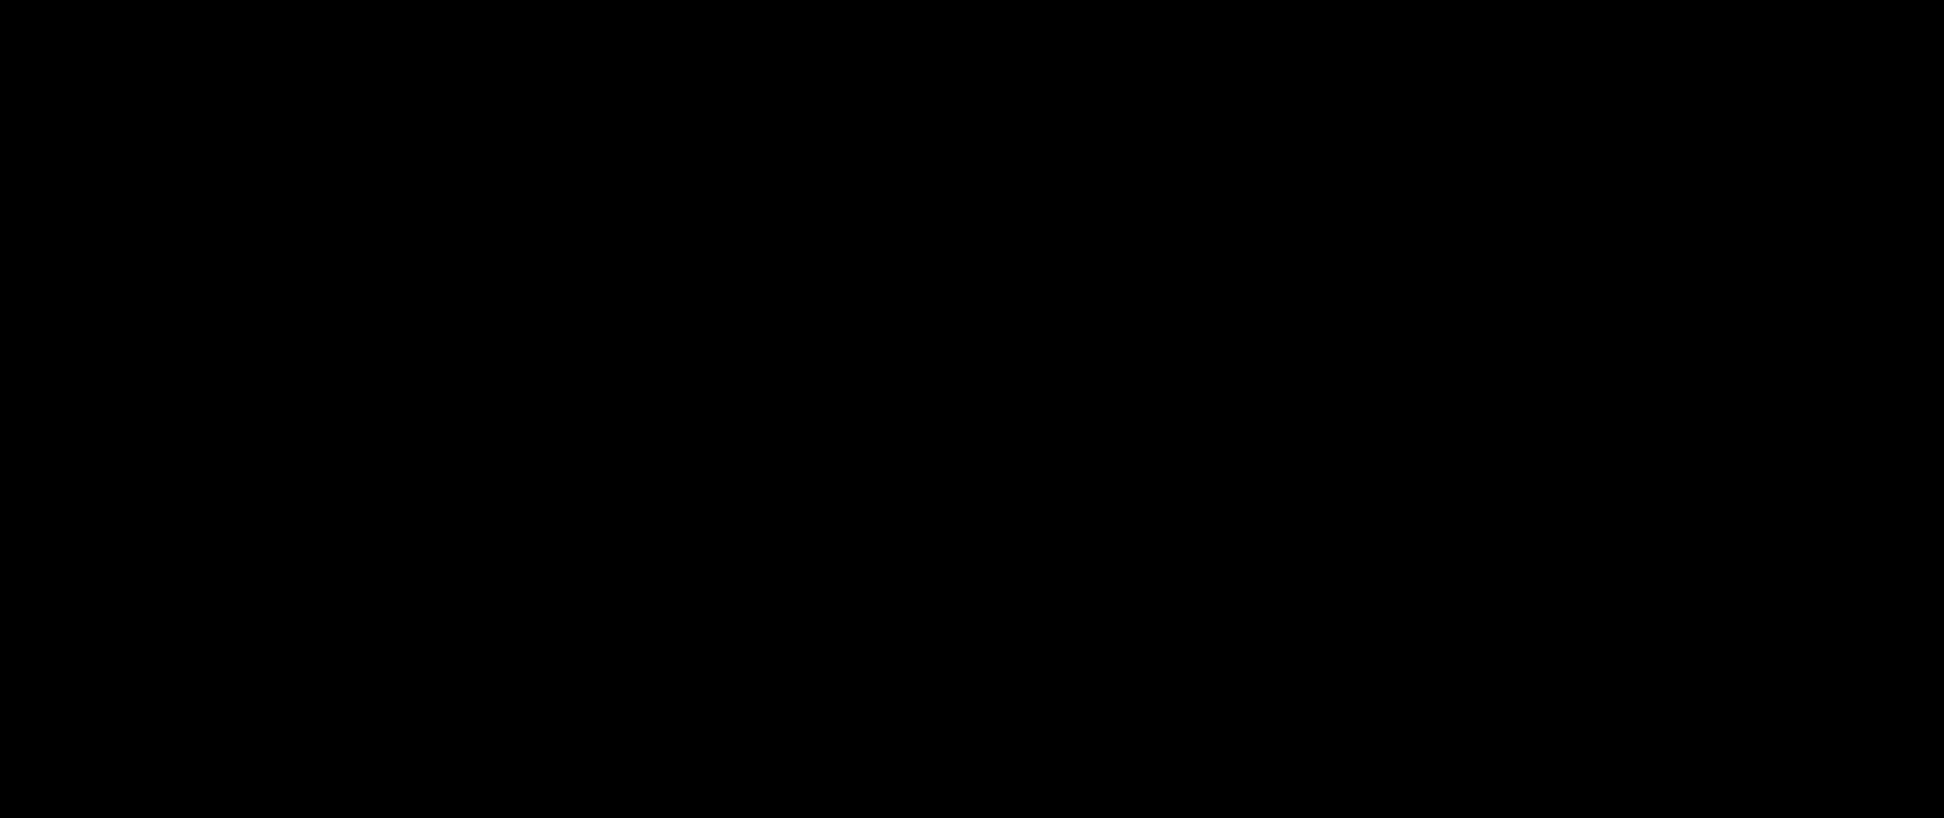 (+)-Biotinylbutylamine